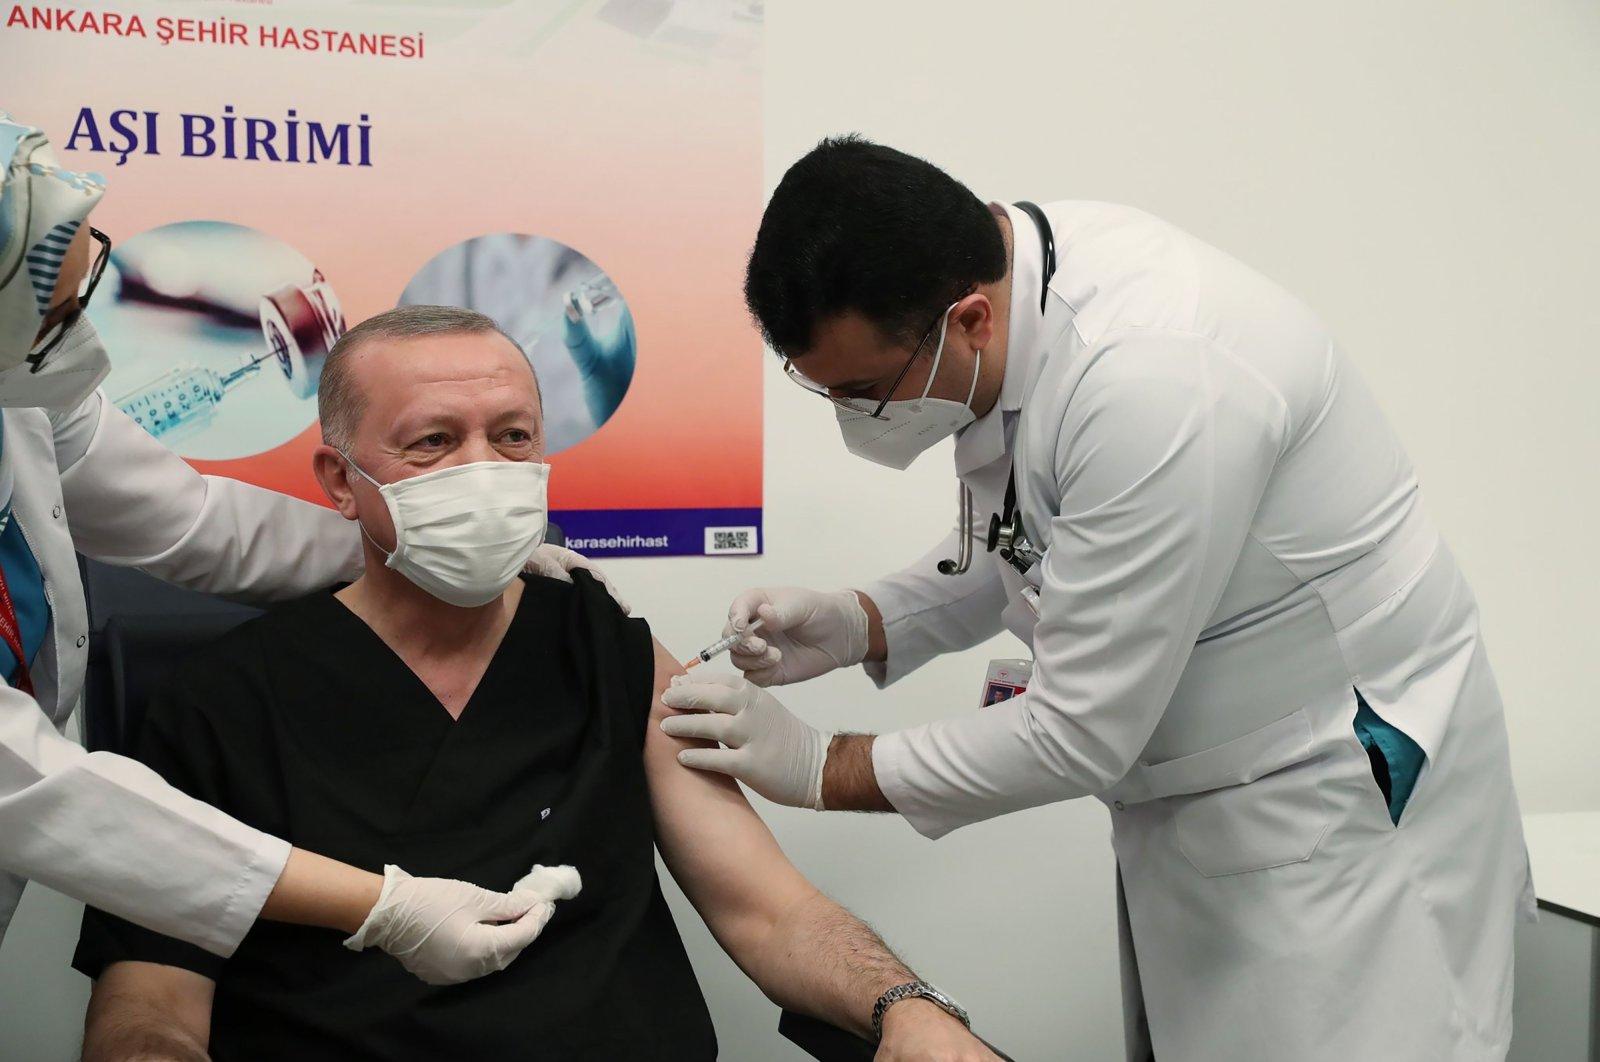 President Recep Tayyip Erdoğan (C) receiving the first dose of the CoronaVac Covid-19 vaccine at Ankara City Hospital in Ankara on Jan. 14, 2021. (Turkish Presidential Press Service Photo)